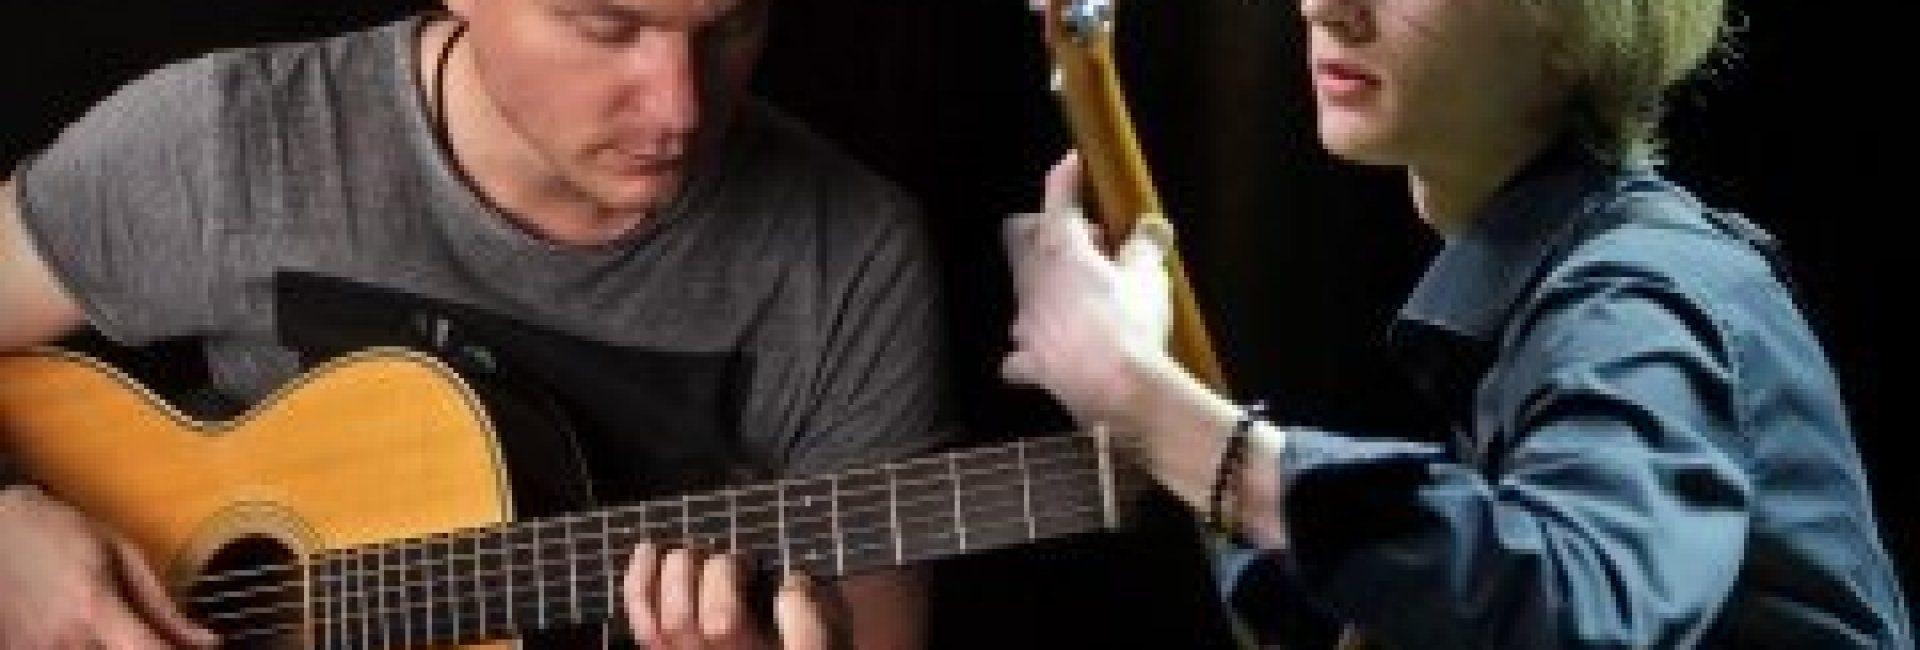 Koncerty gitarowe fingerstyle